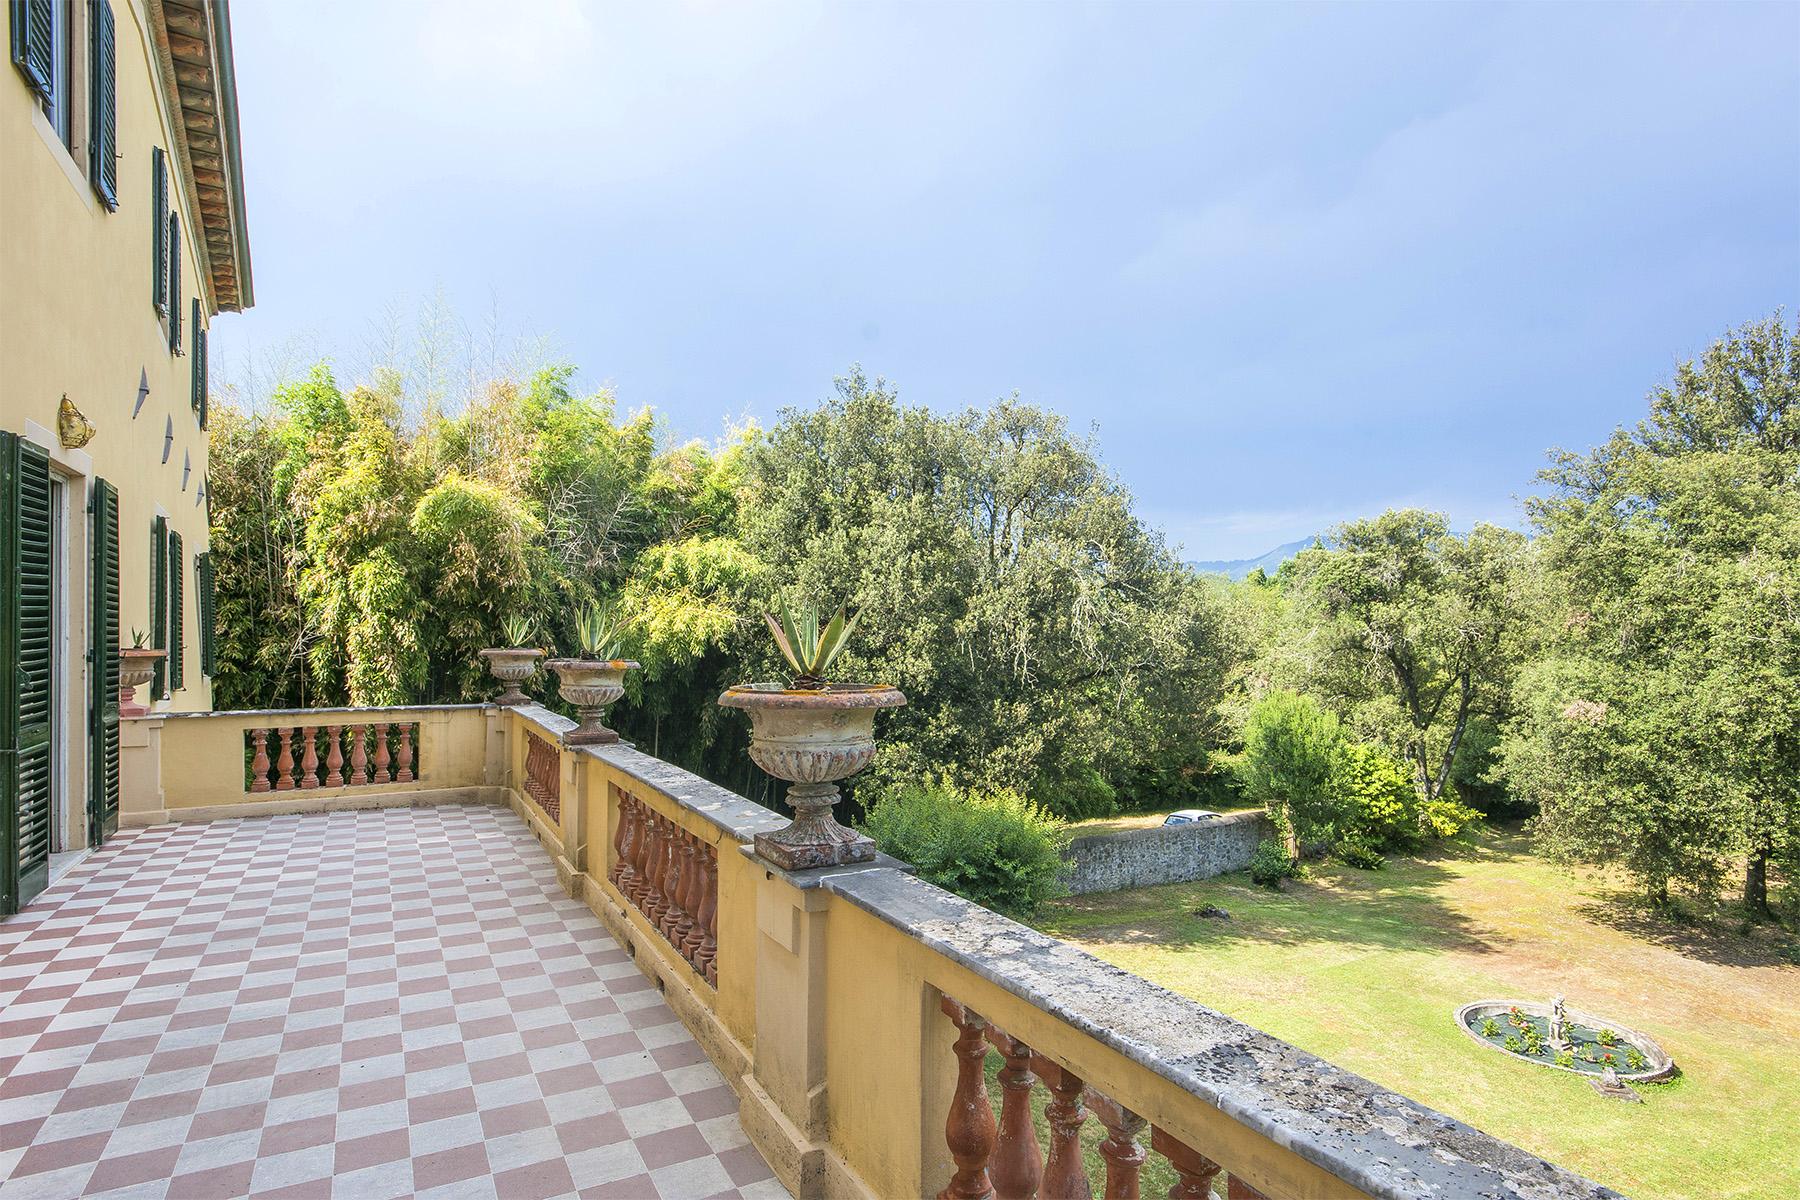 Villa in Vendita a Lucca: 5 locali, 1150 mq - Foto 12